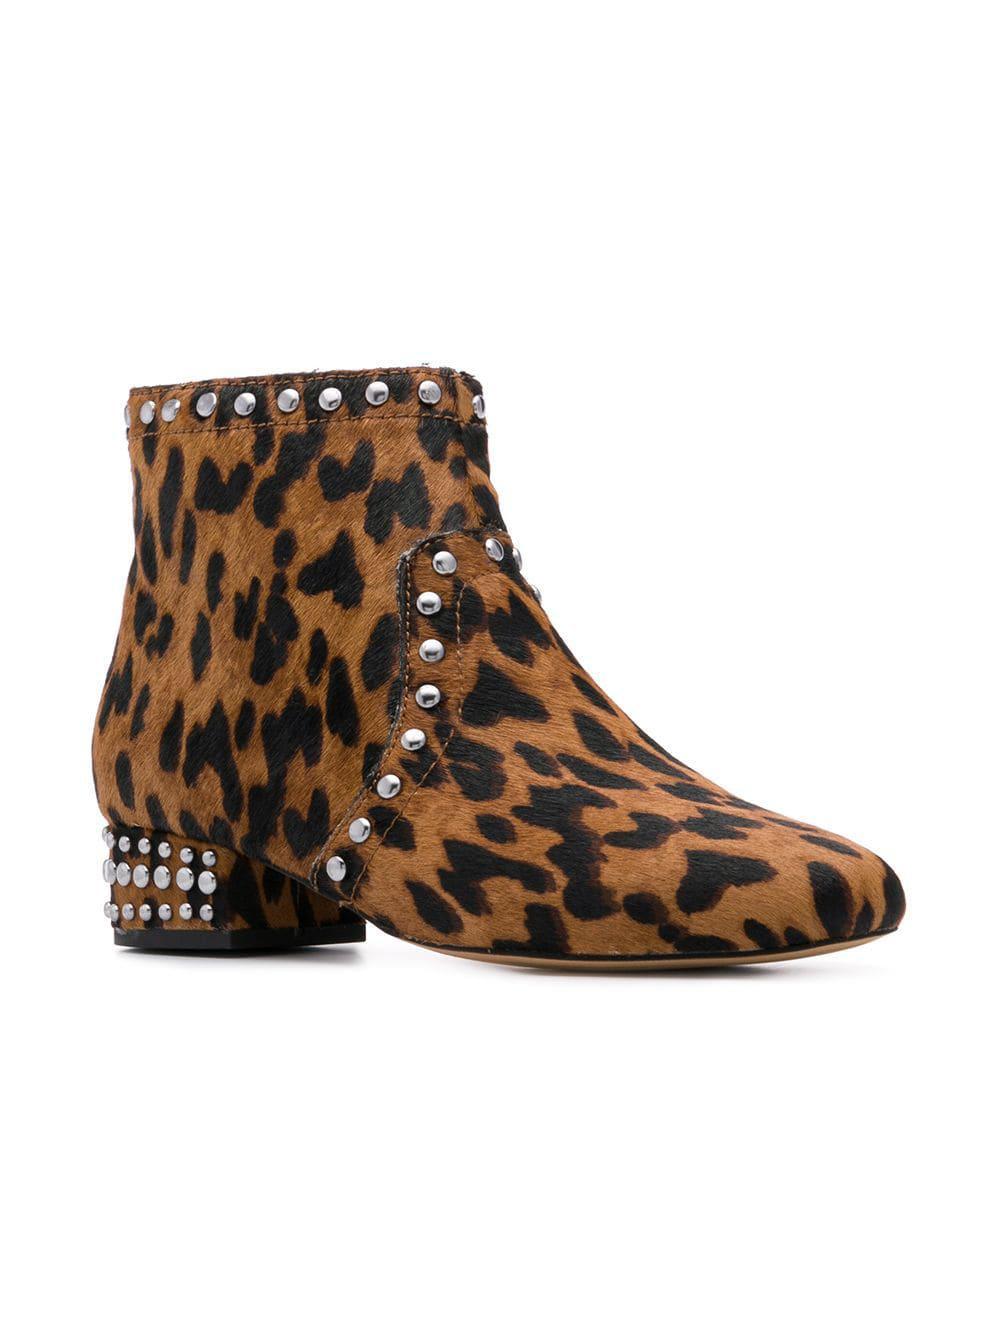 4481604c84cdb3 Lyst - Sam Edelman Leopard Print Boots in Brown